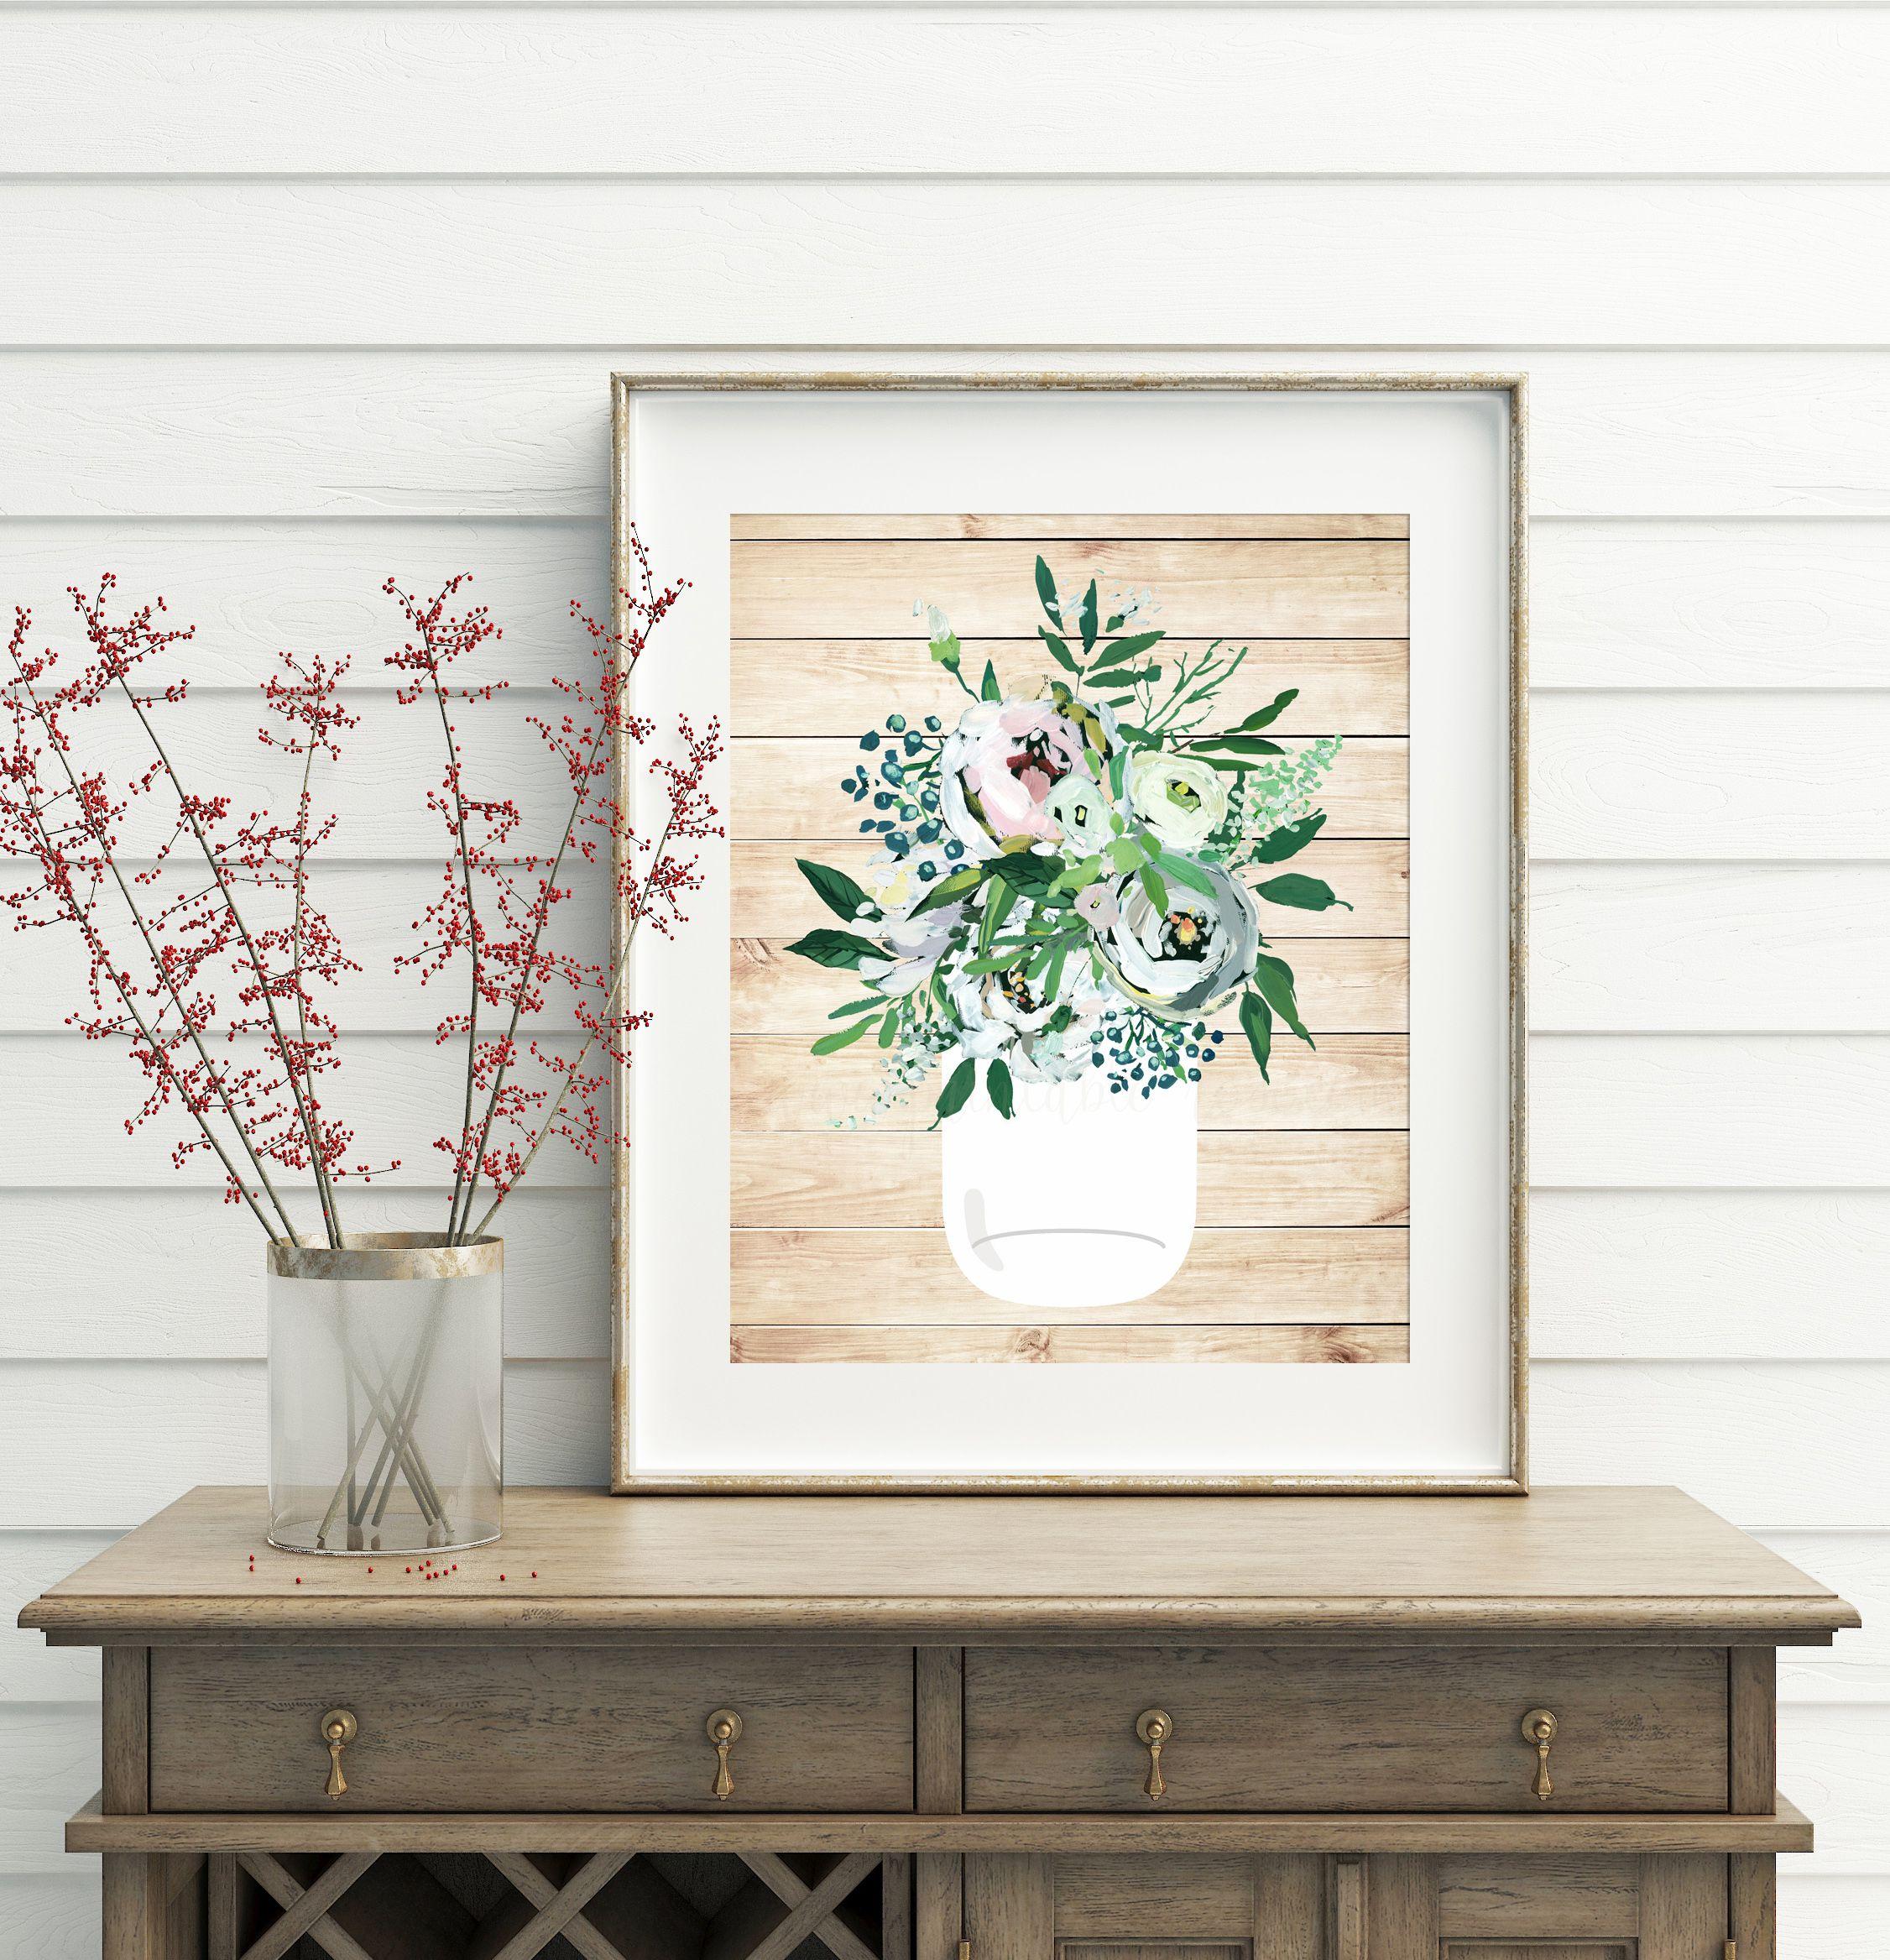 Shabby Chic Decor Printable Wall Decor Shabby Chic Wall Decor